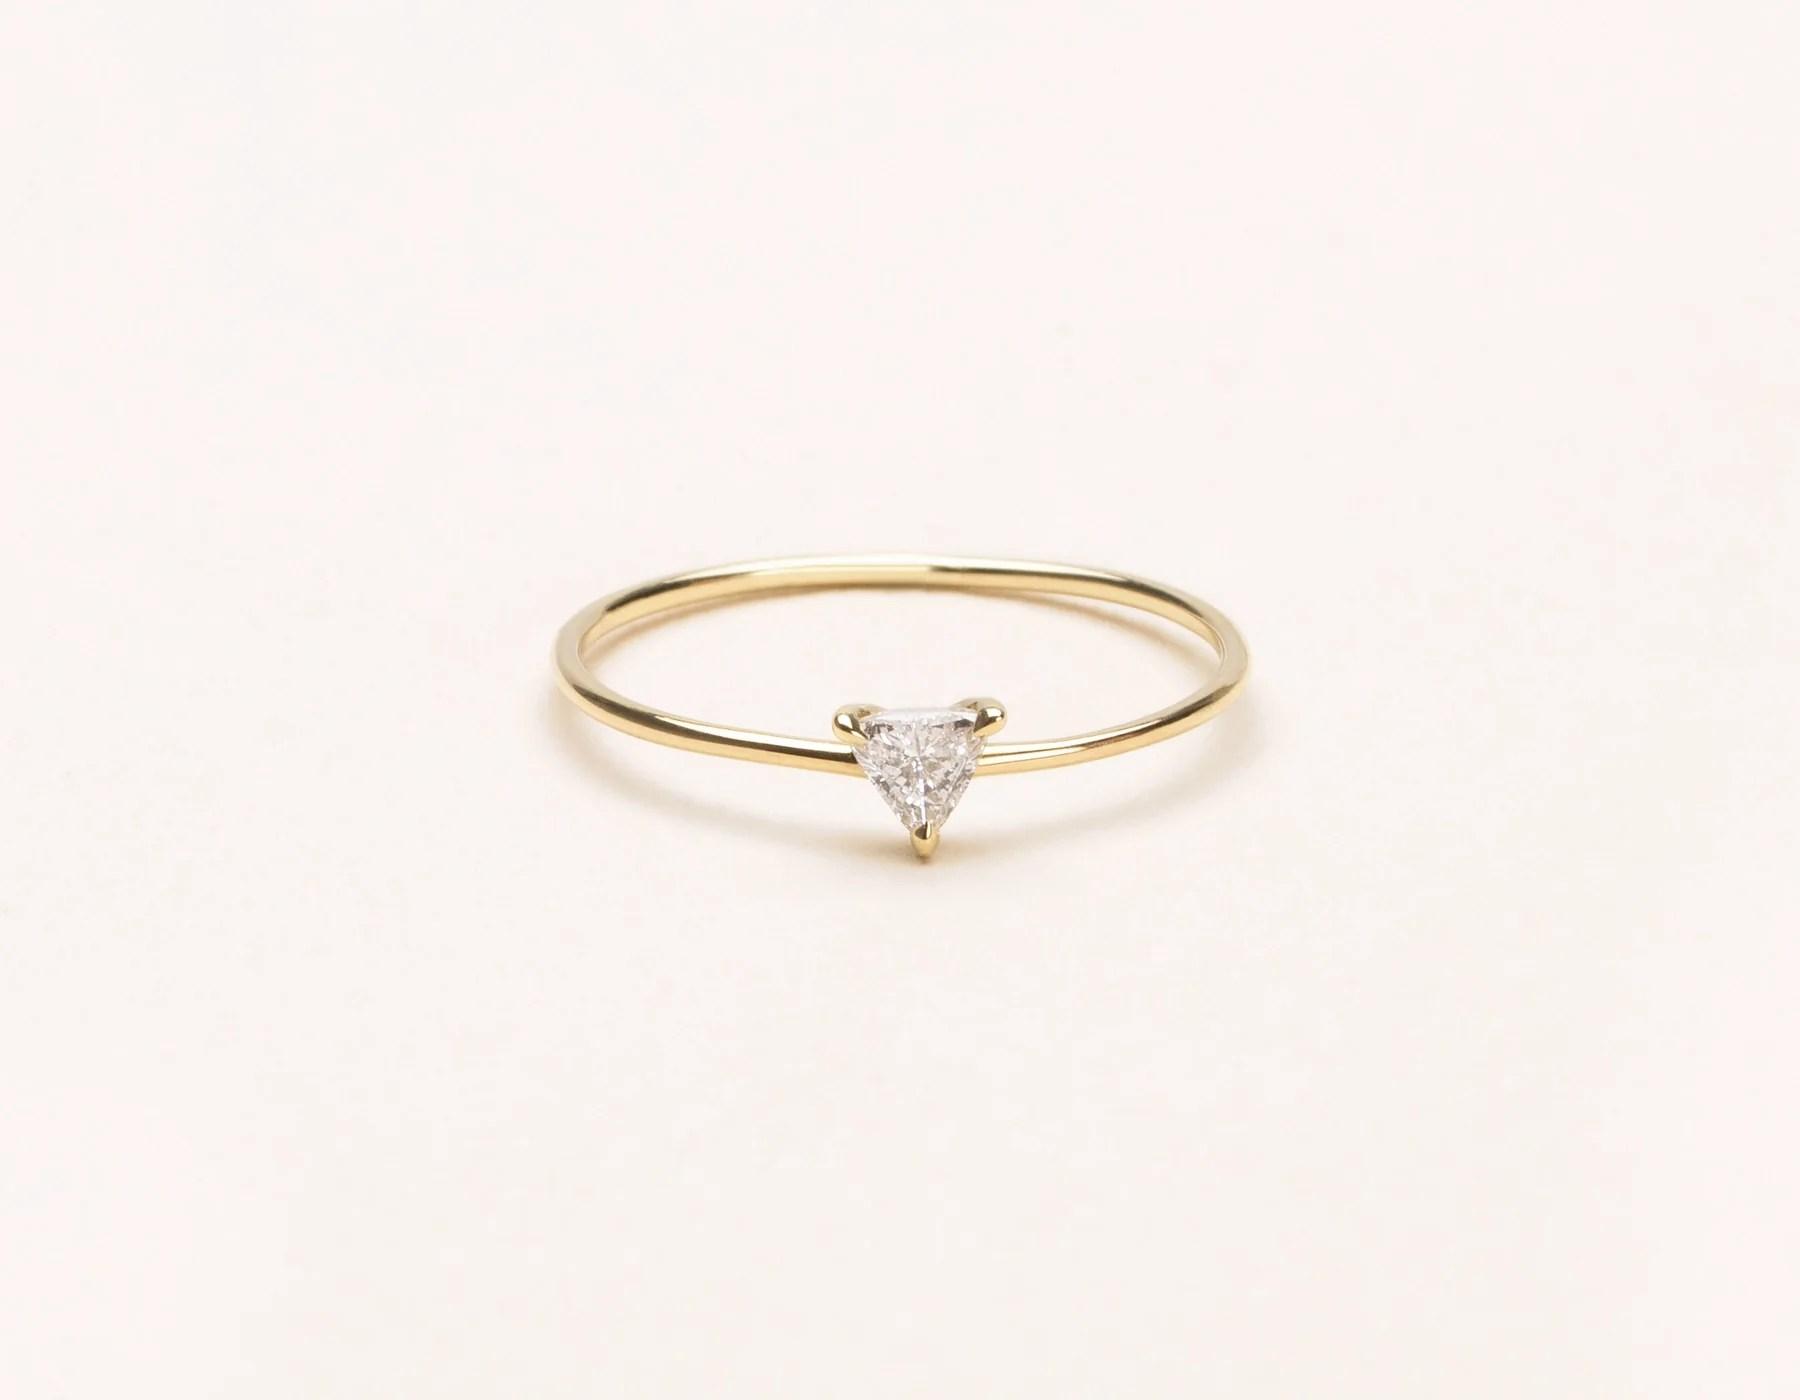 14k Trillion Diamond Ring Vrai Oro